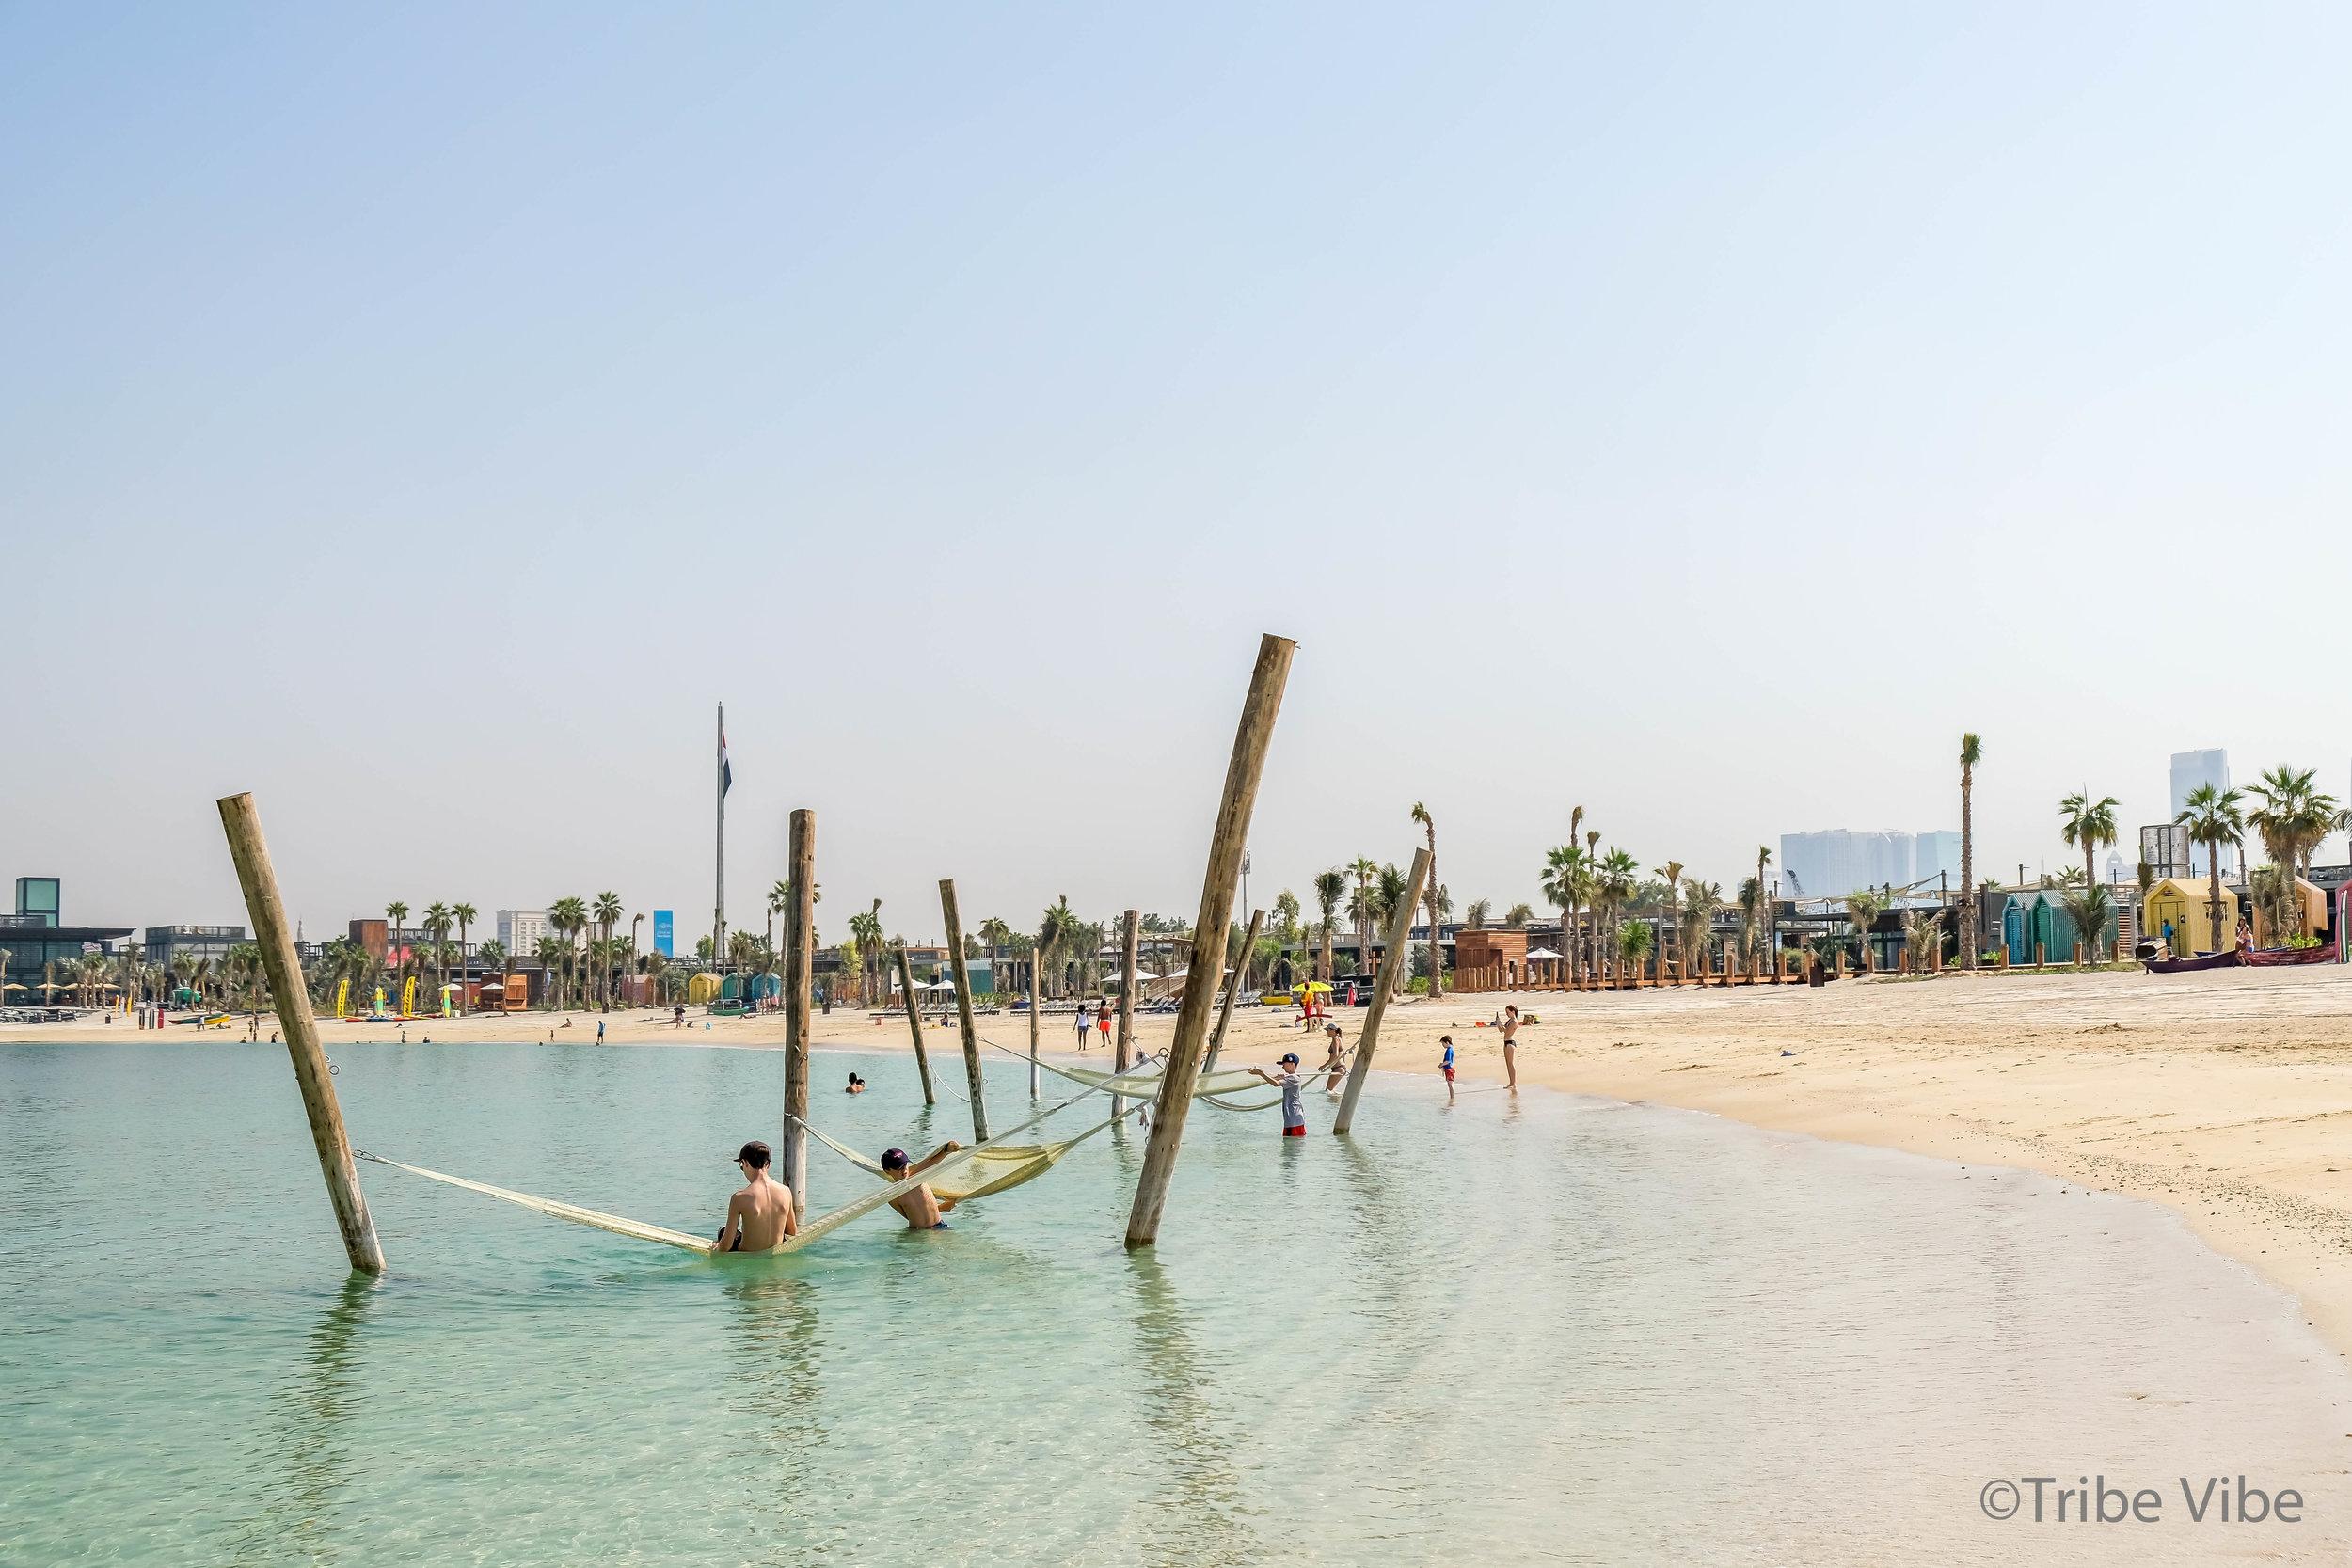 Swinging in the sea hammocks at La Mer beach, Dubai